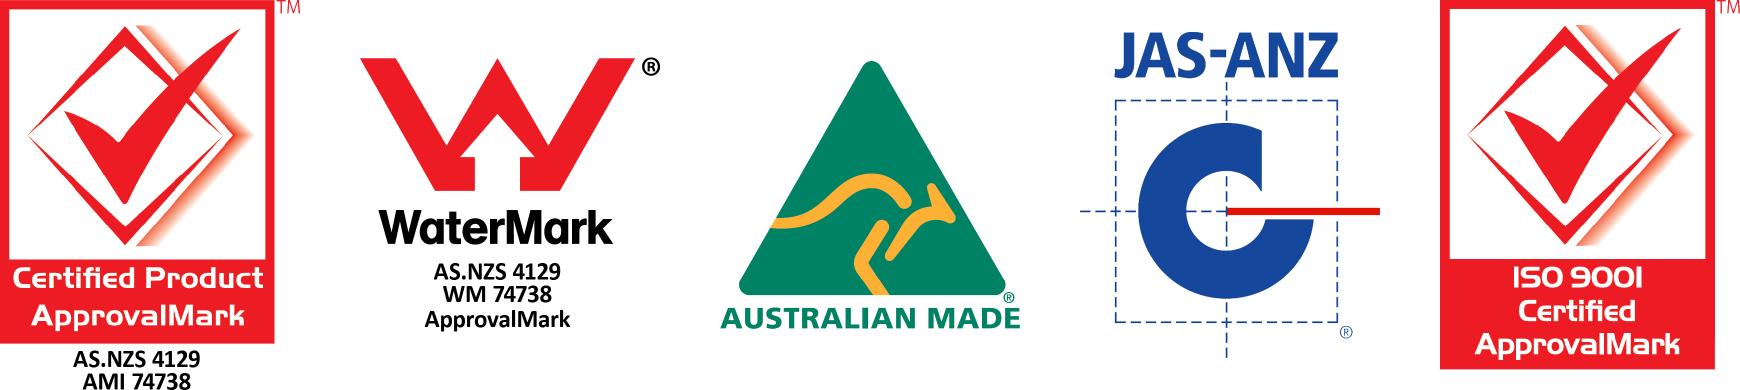 Pipestar Australia Australian Made